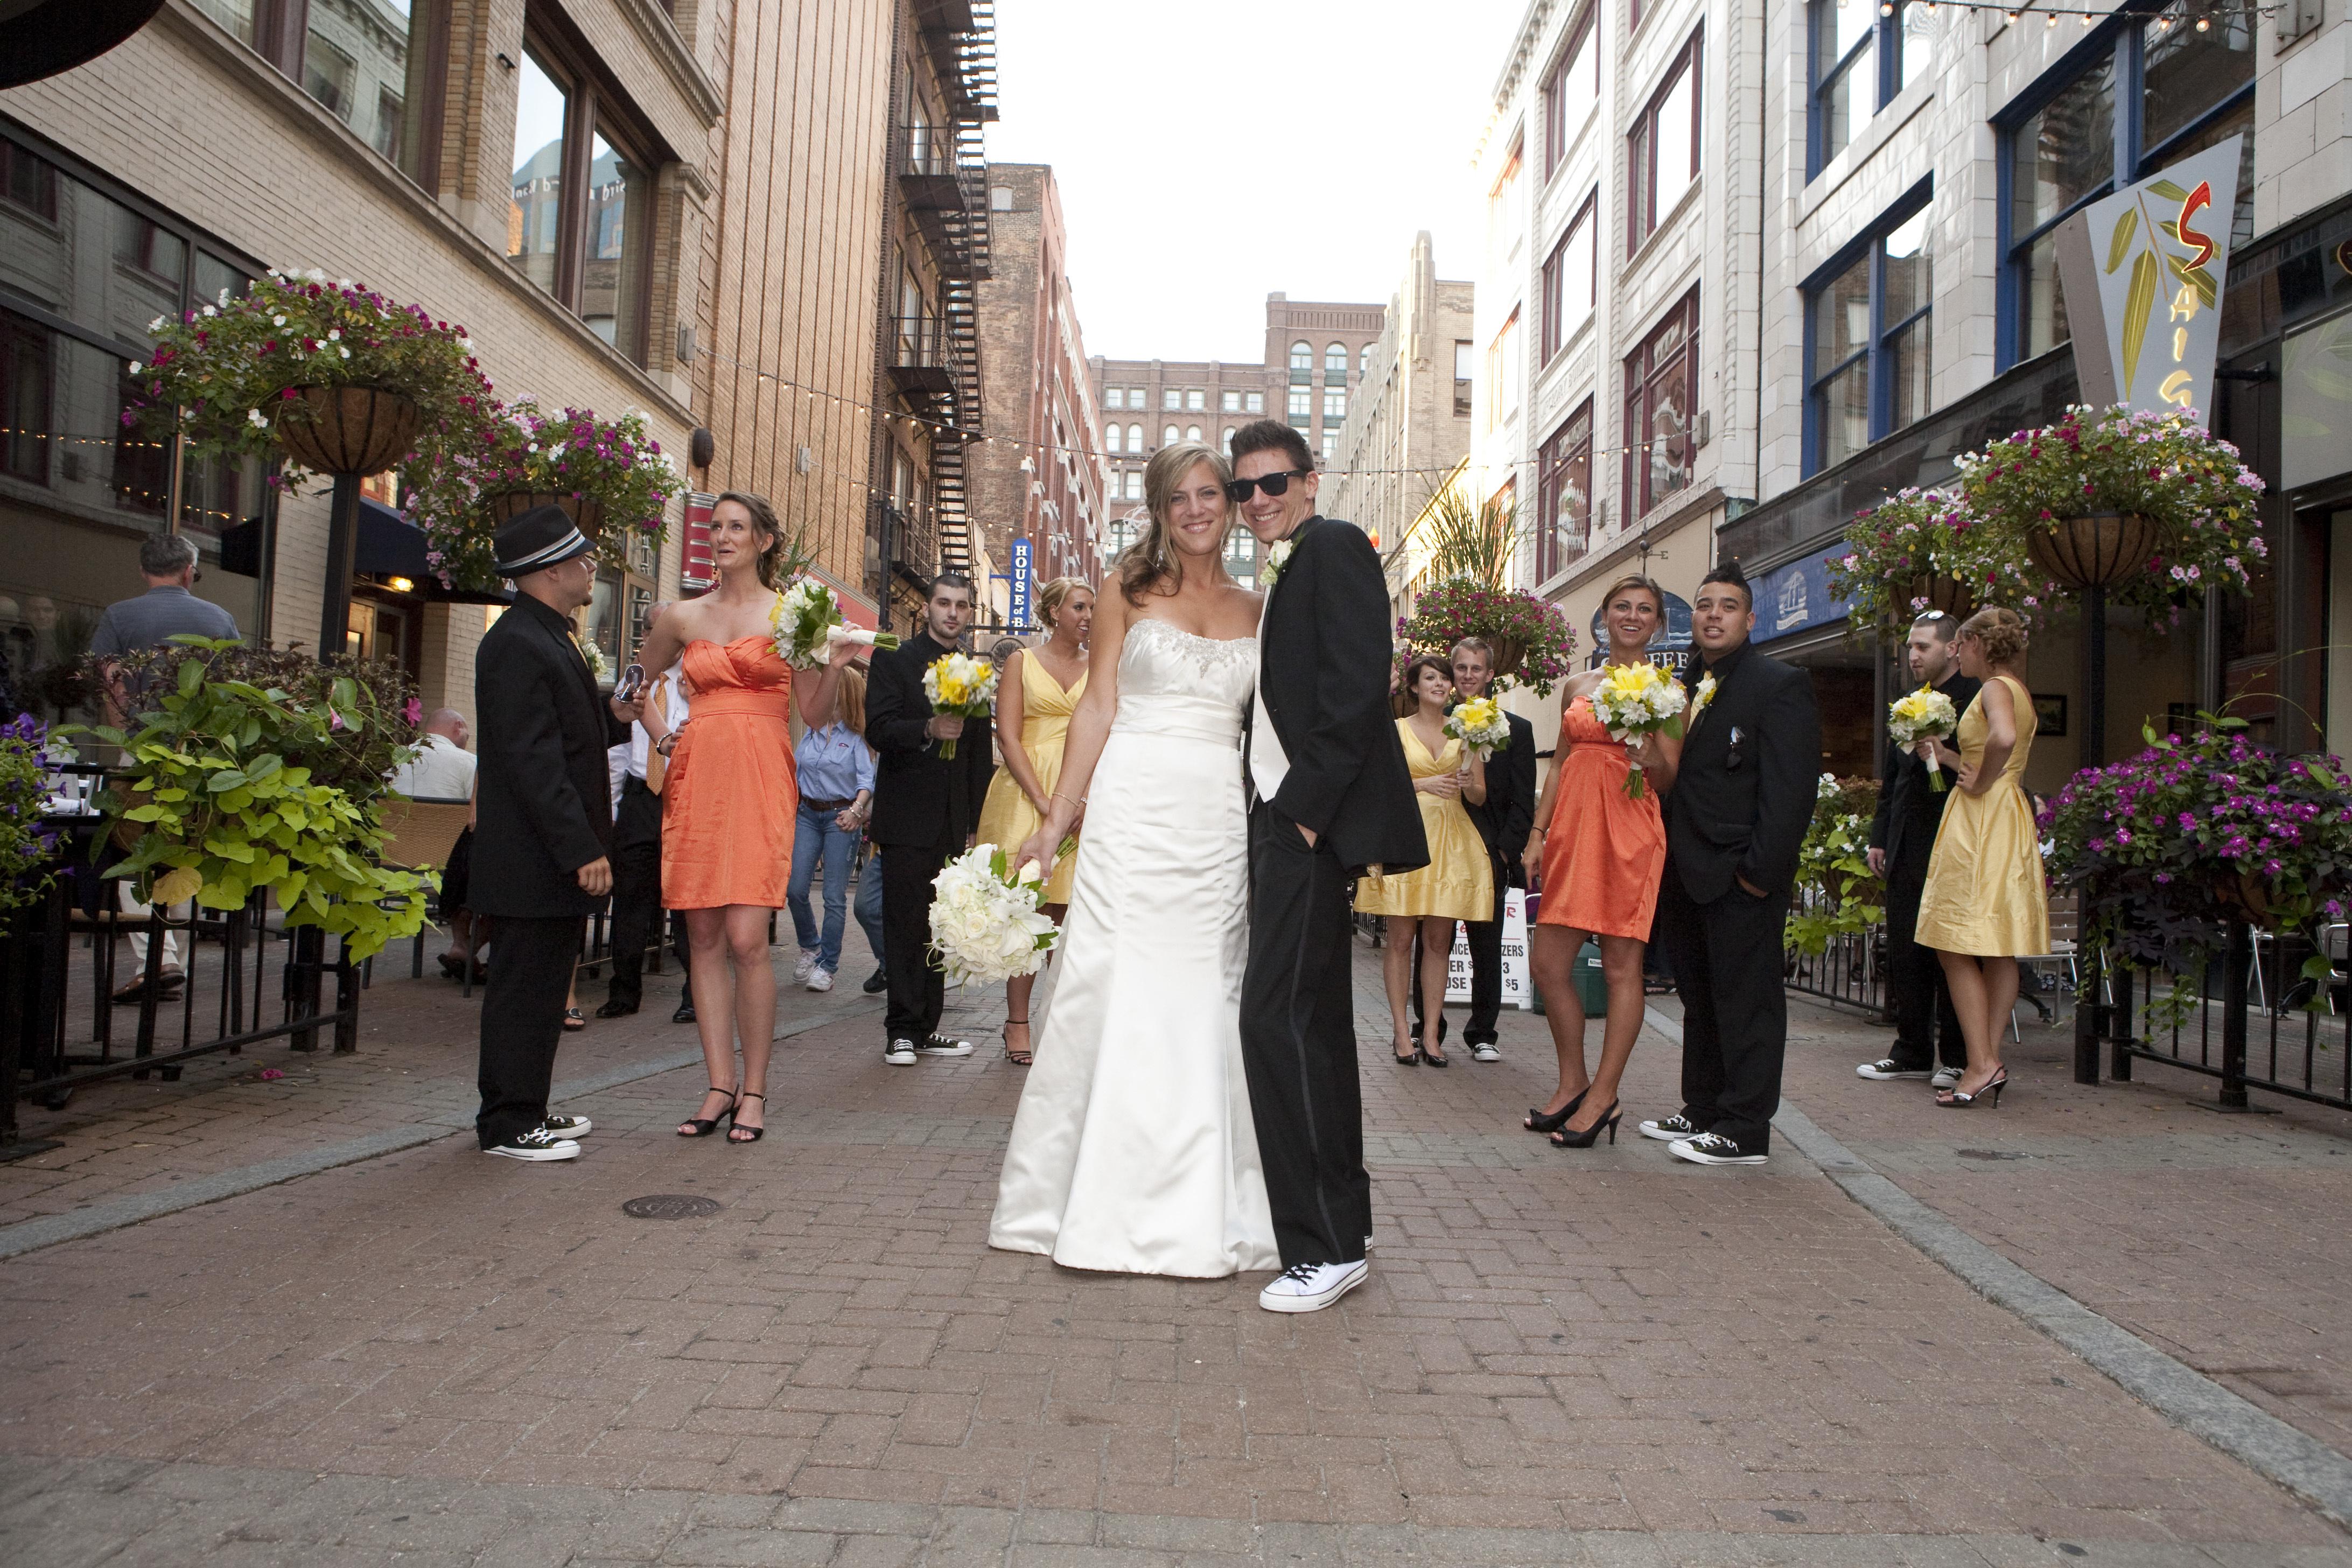 Wedding Dresses, Fashion, yellow, orange, dress, City, Party, Bridal, Jim hjelm, Strapless, Strapless Wedding Dresses, Urban